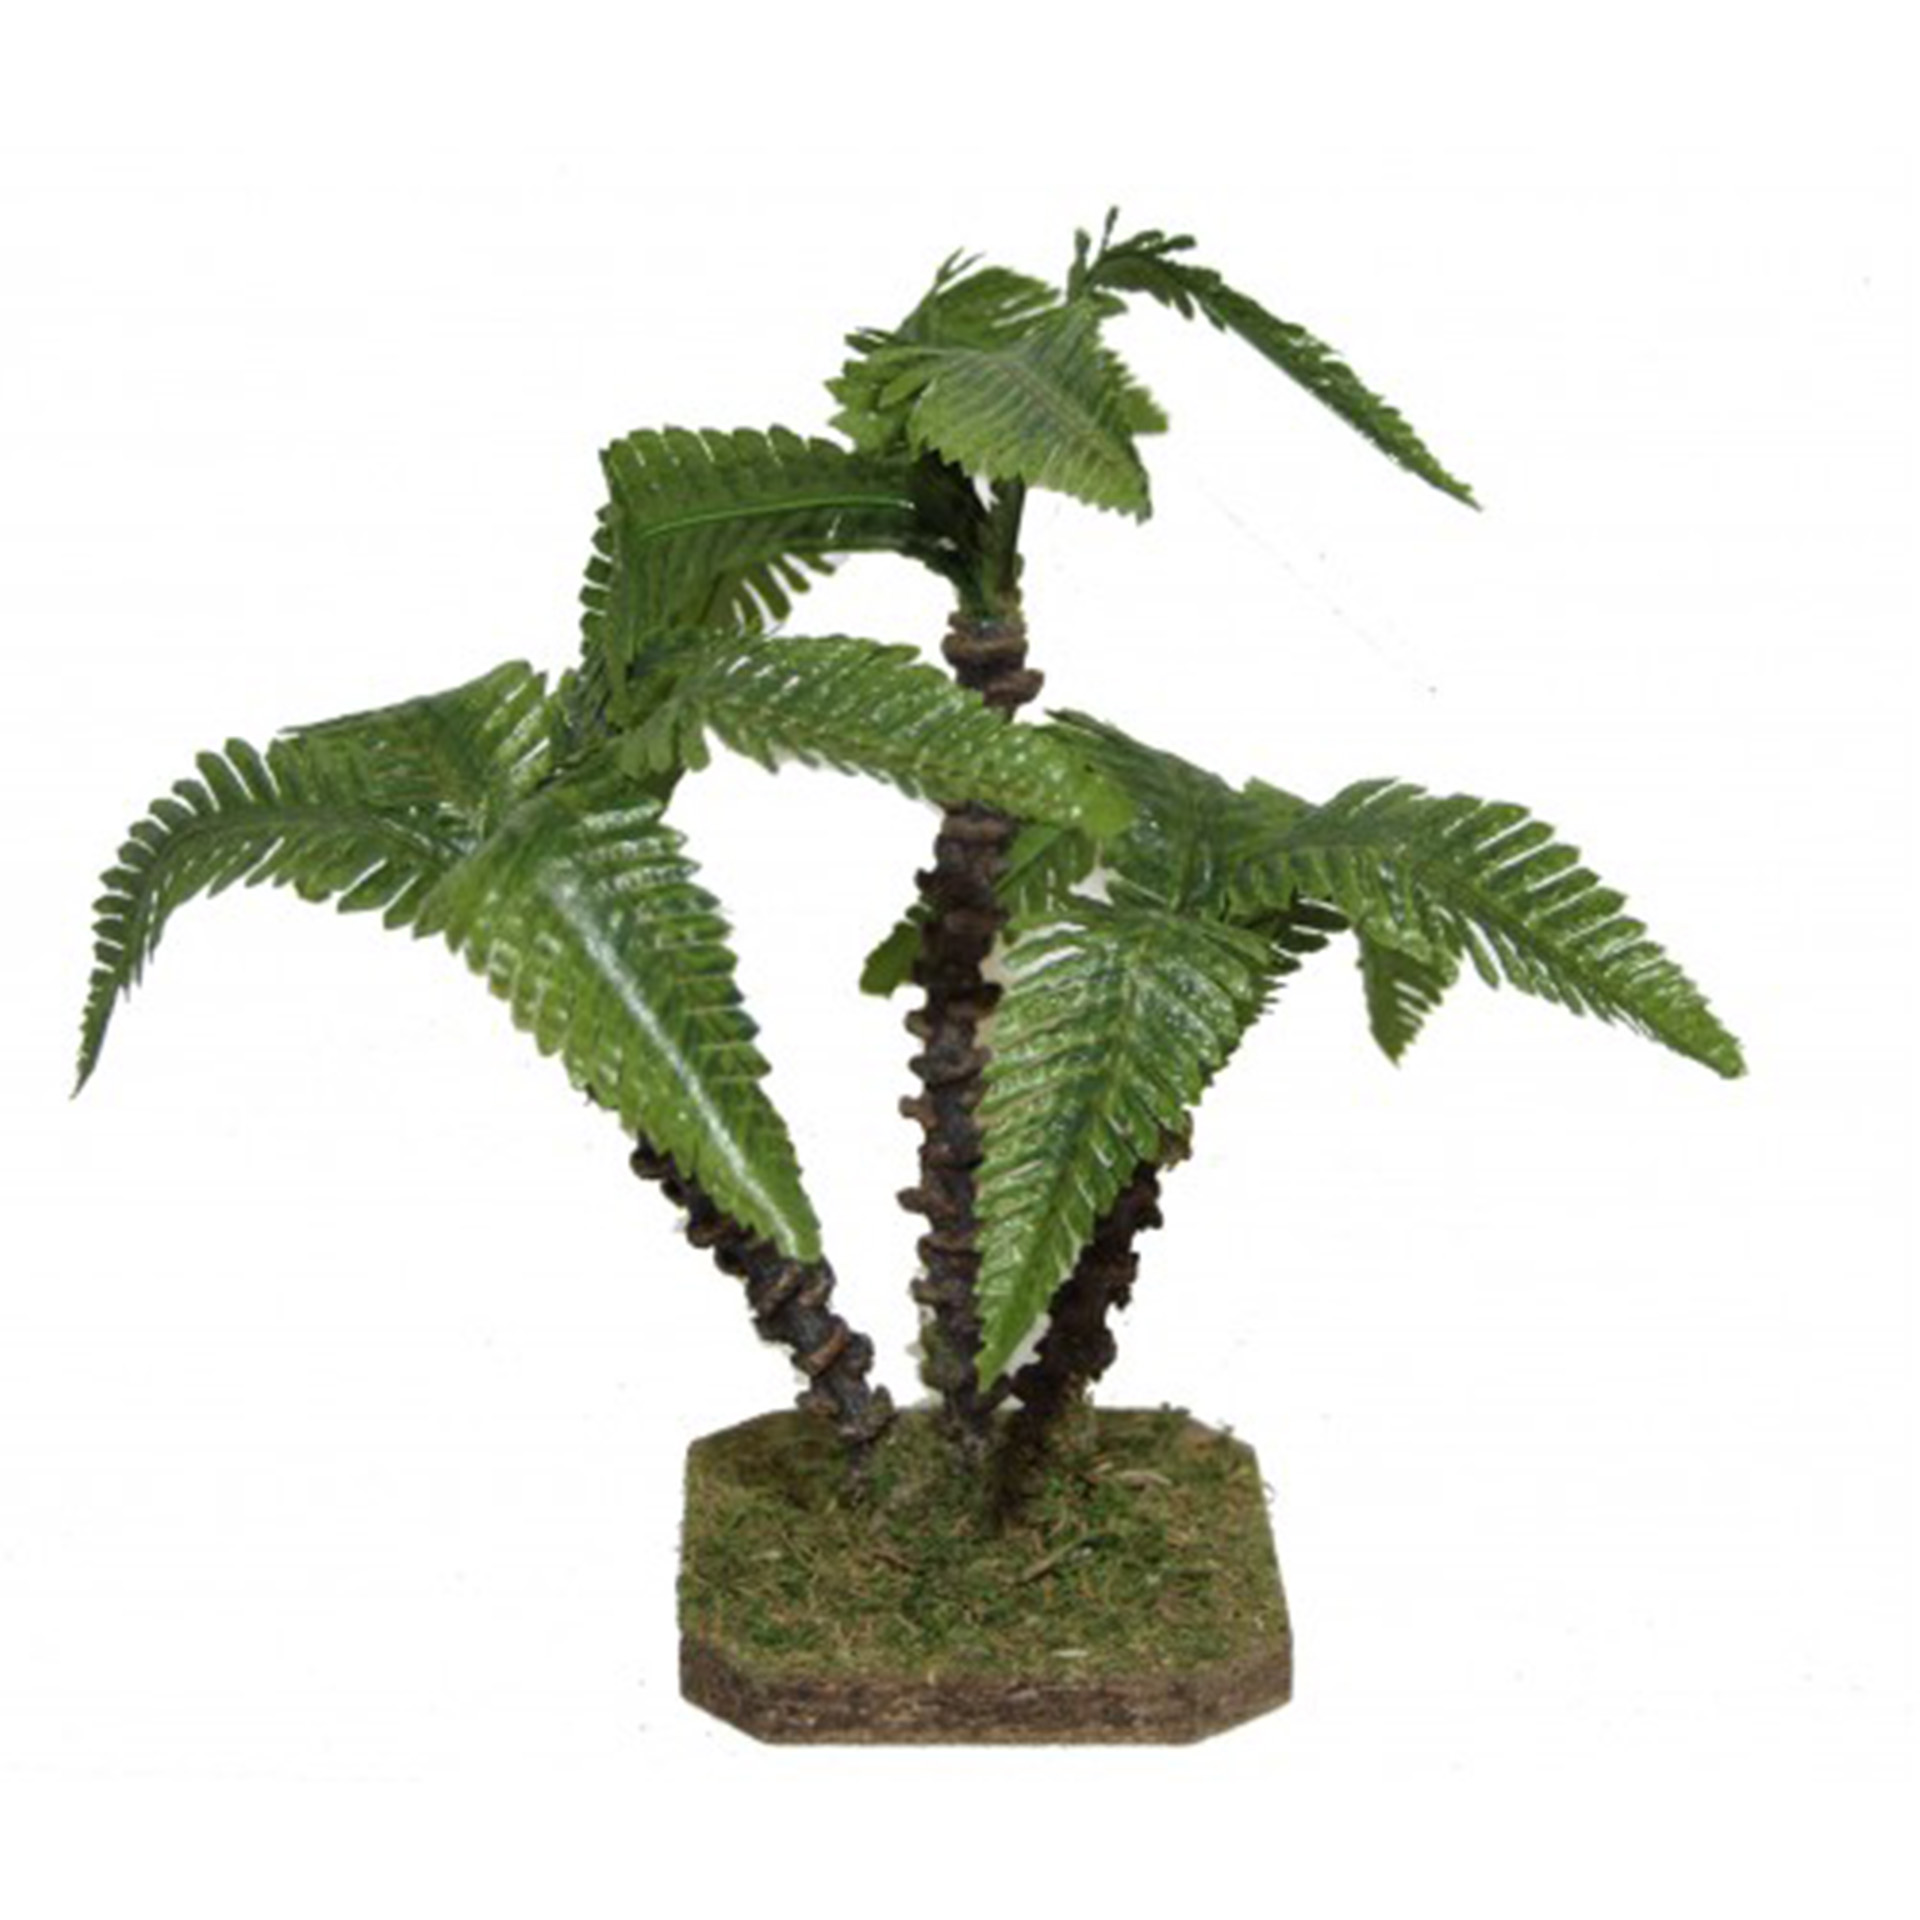 Dreier-Palme hellgrün, Höhe 23cm